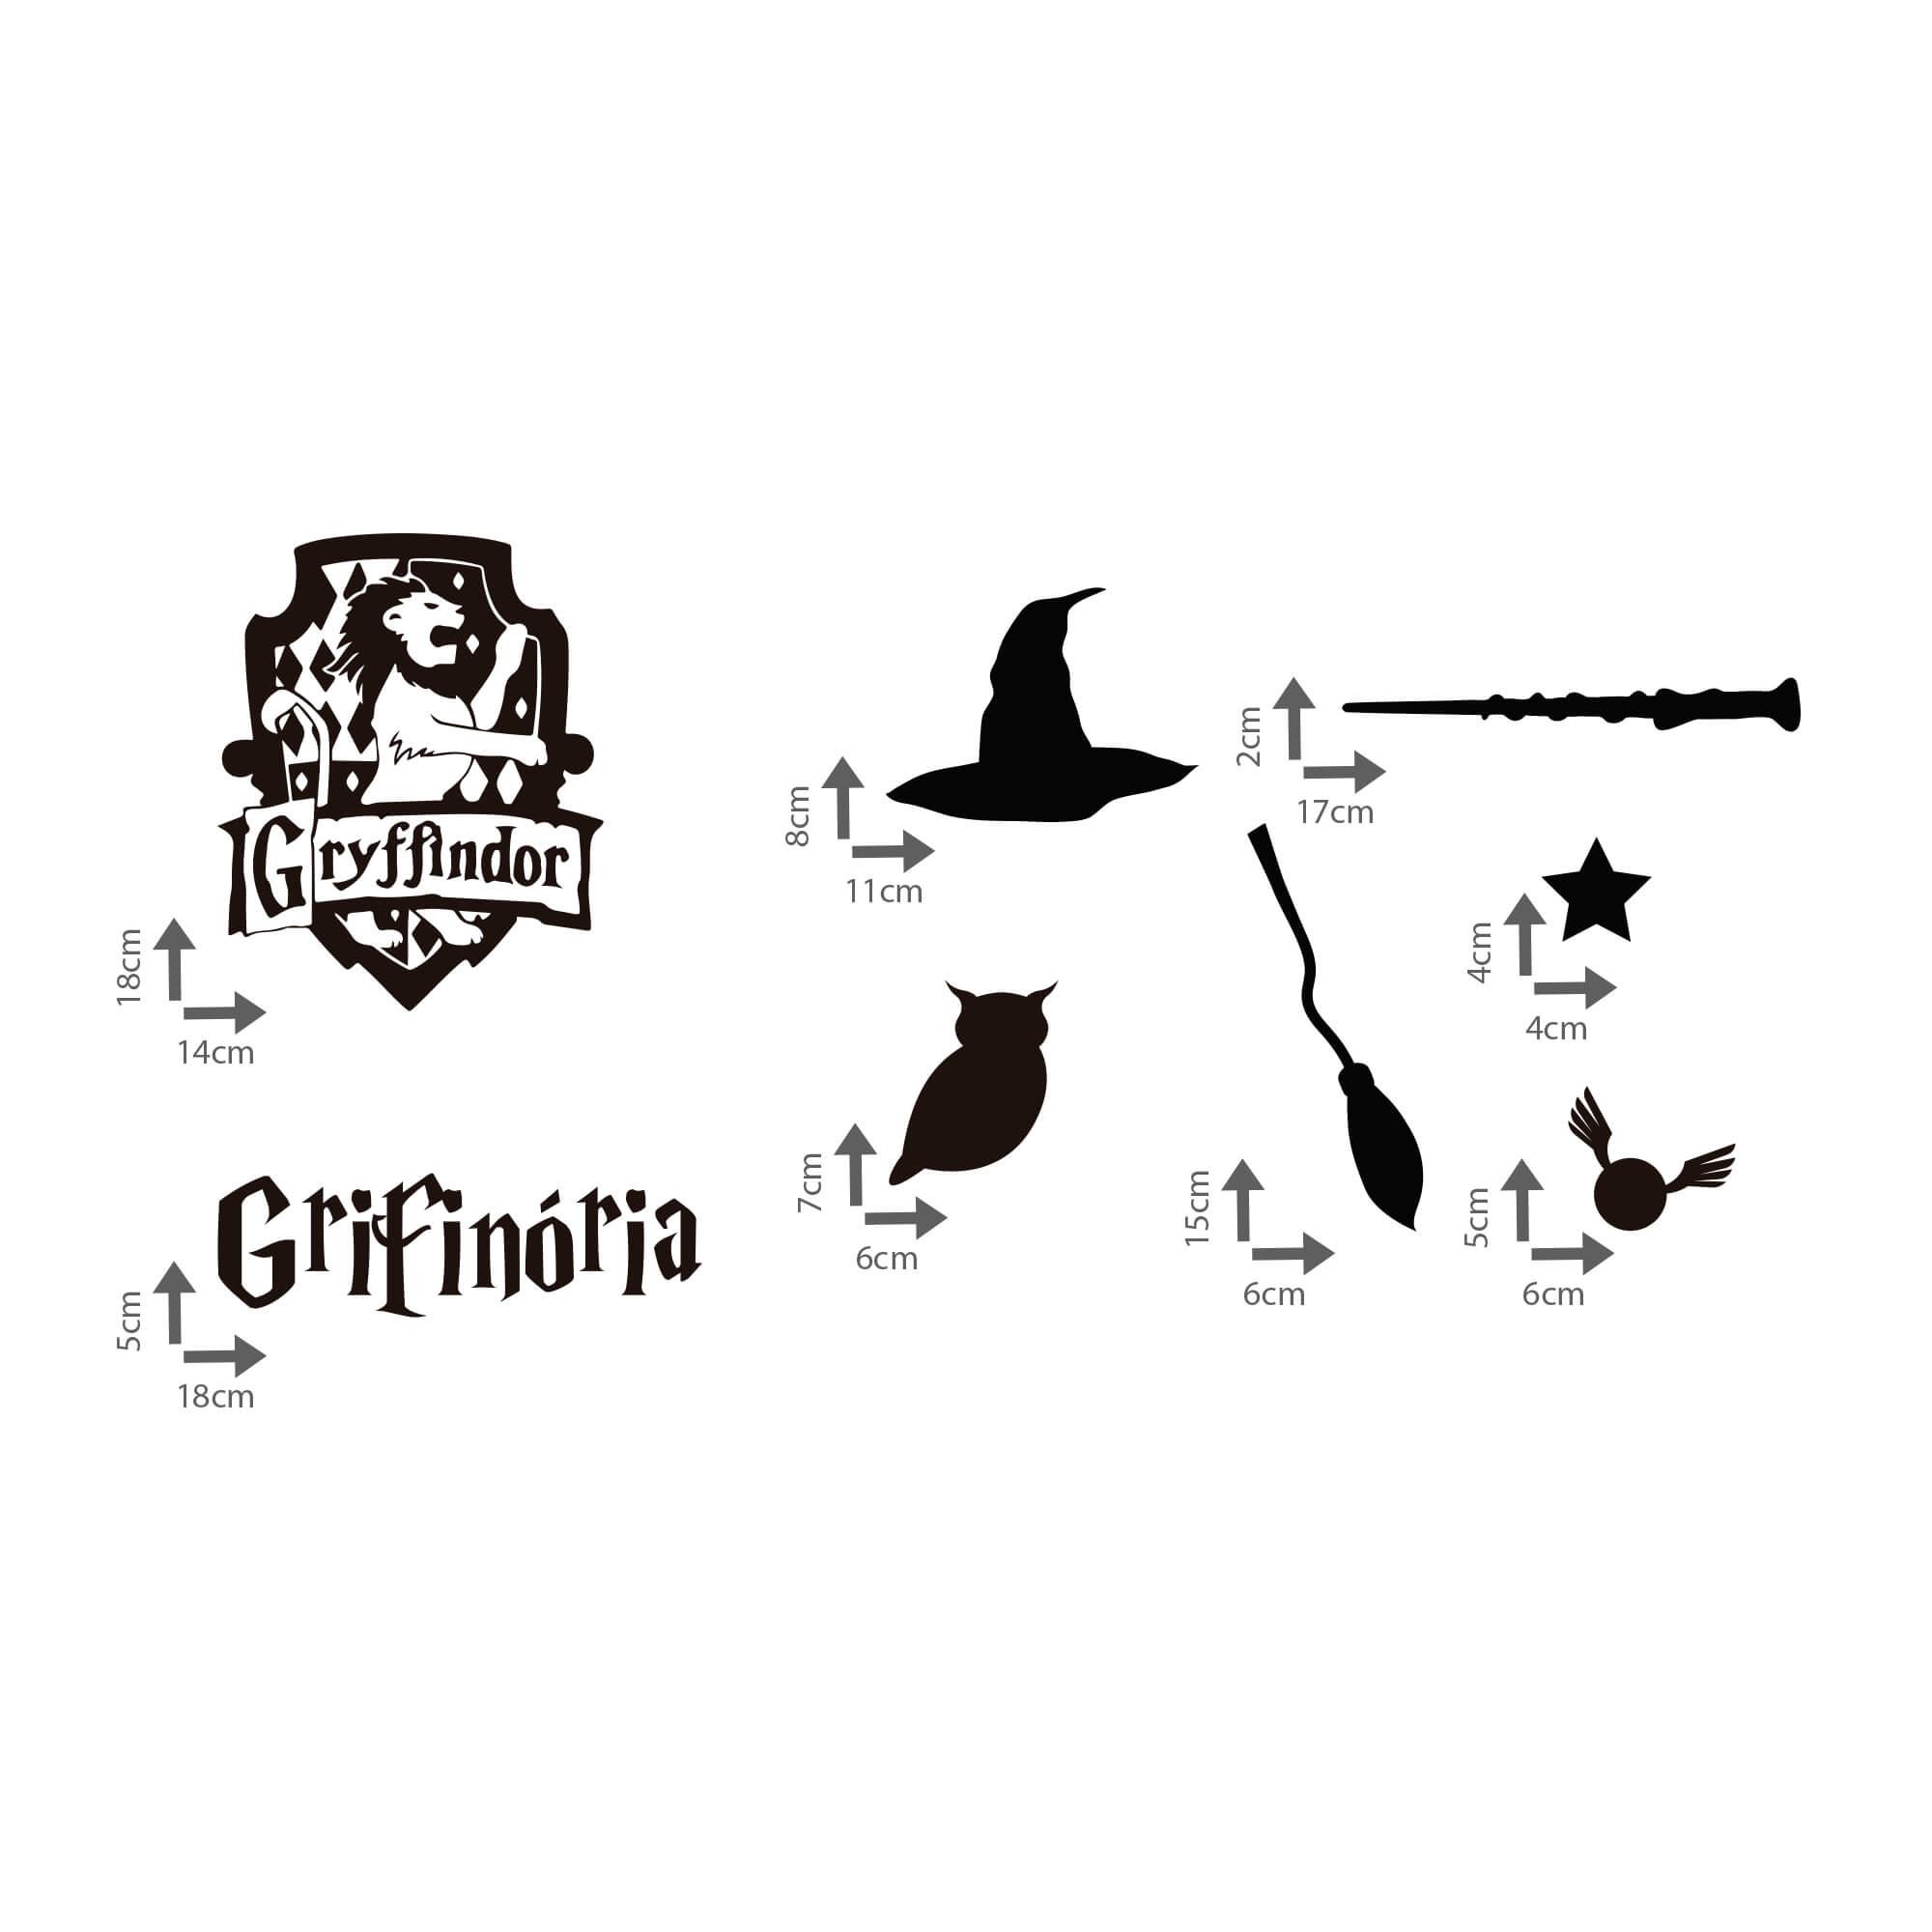 Kit de Adesivos Grifinória Elementos Harry Potter Hogawarts